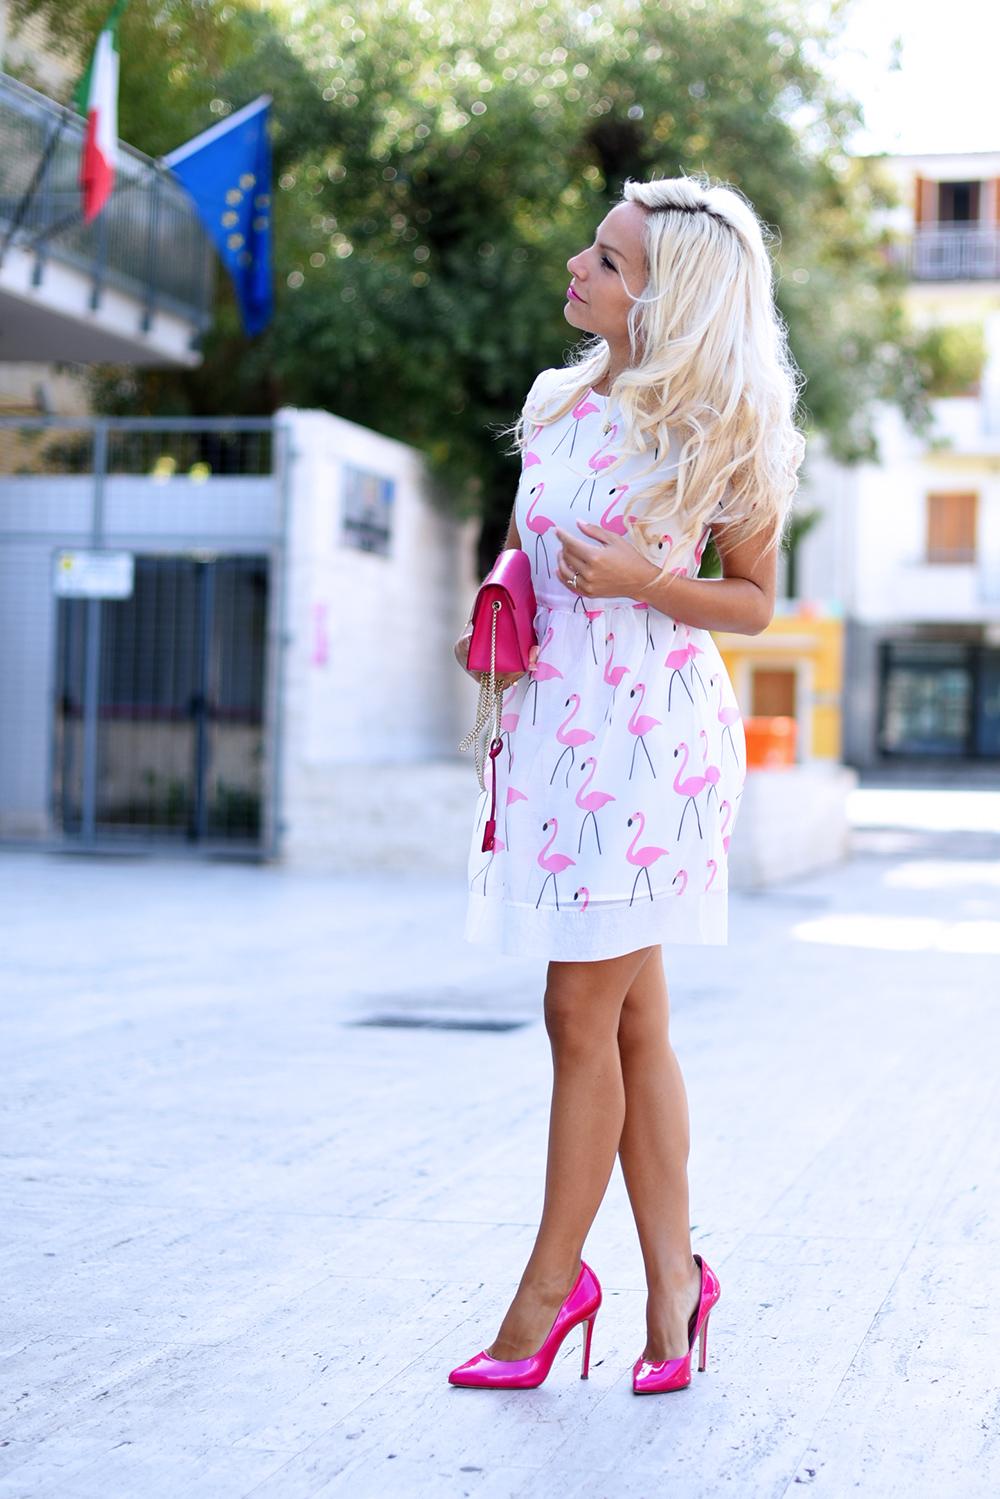 Choies dress, Choies, skater dress, metropolis Furla prezzo colori, dove trovare la Metropolis Furla - outfit fashion blogger It-Girl by Eleonora Petrella